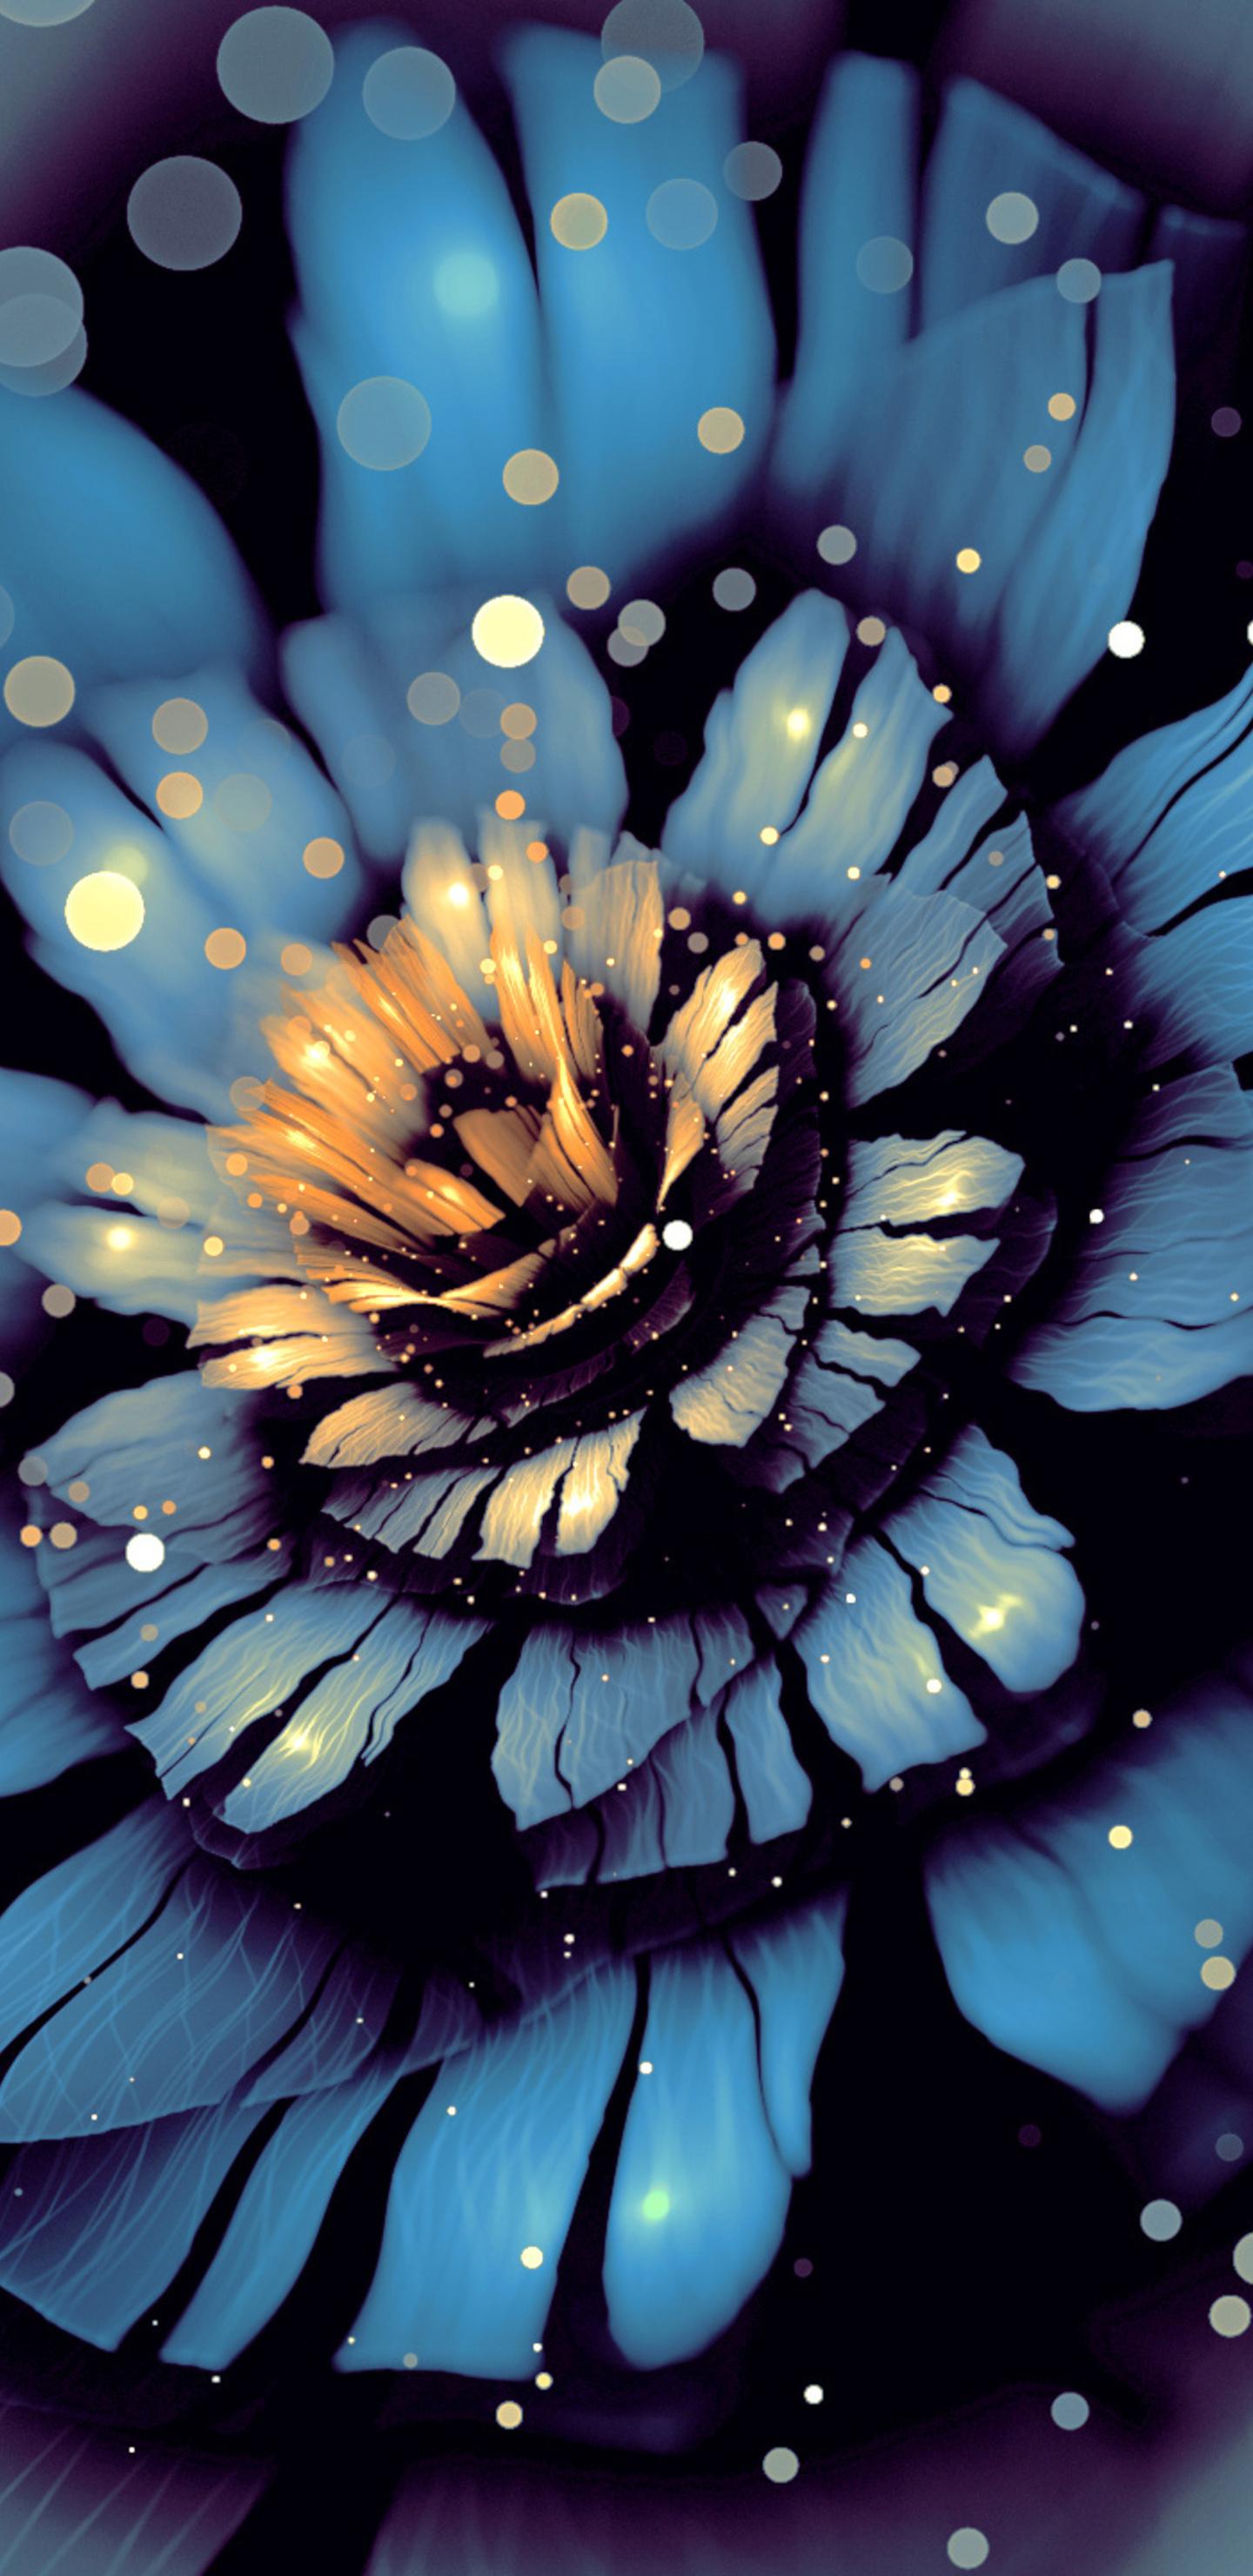 apophysis-bloom-flower-digital-art-at.jpg